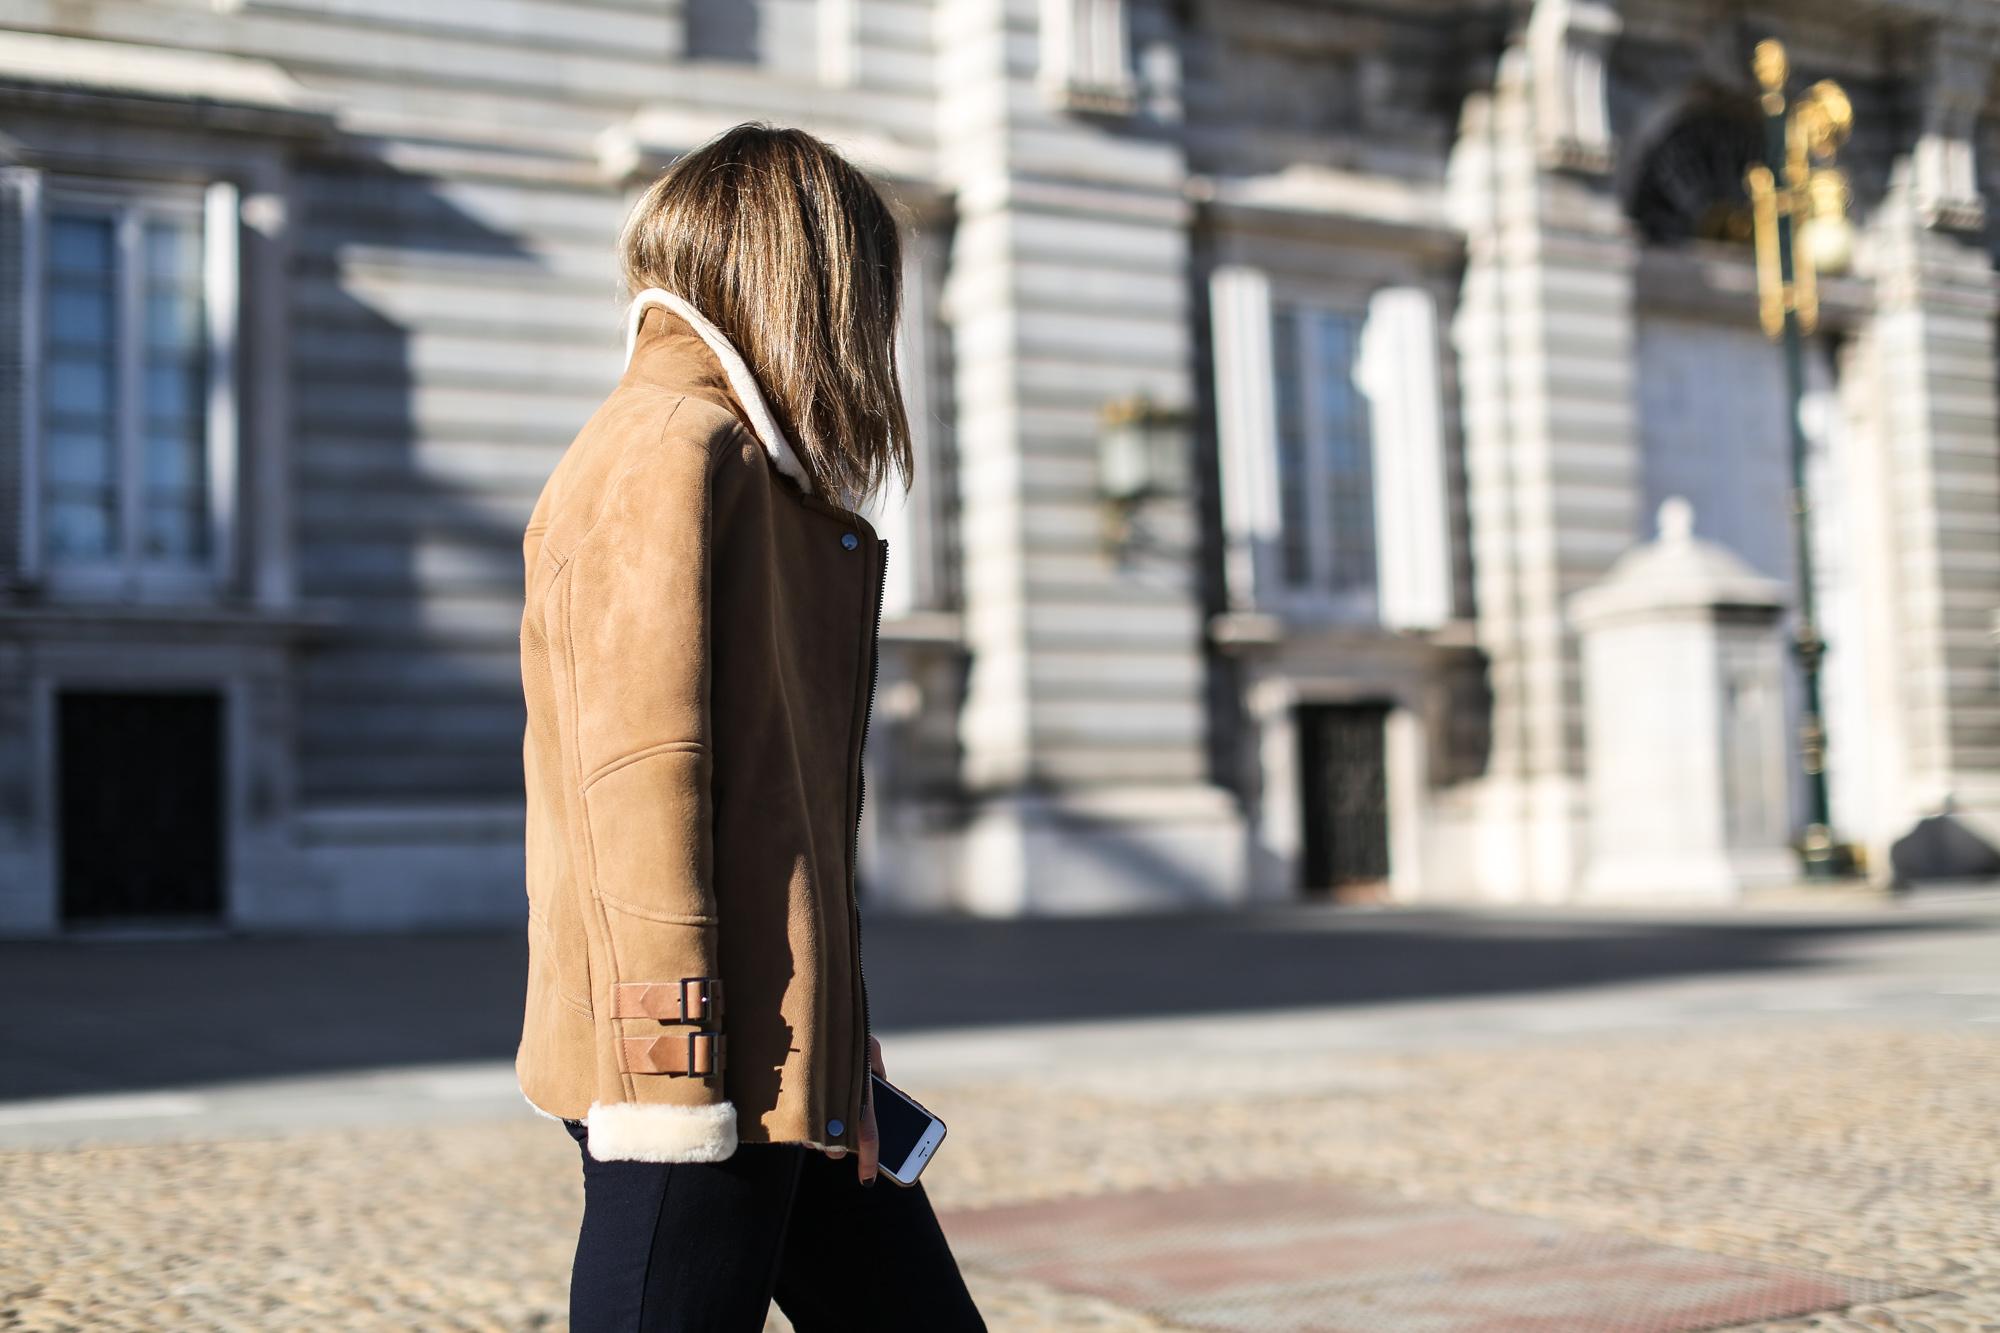 Clochet_streetstyle_mango_suede_leather_aviator_coat_adidas_samba_leztinstreet-9